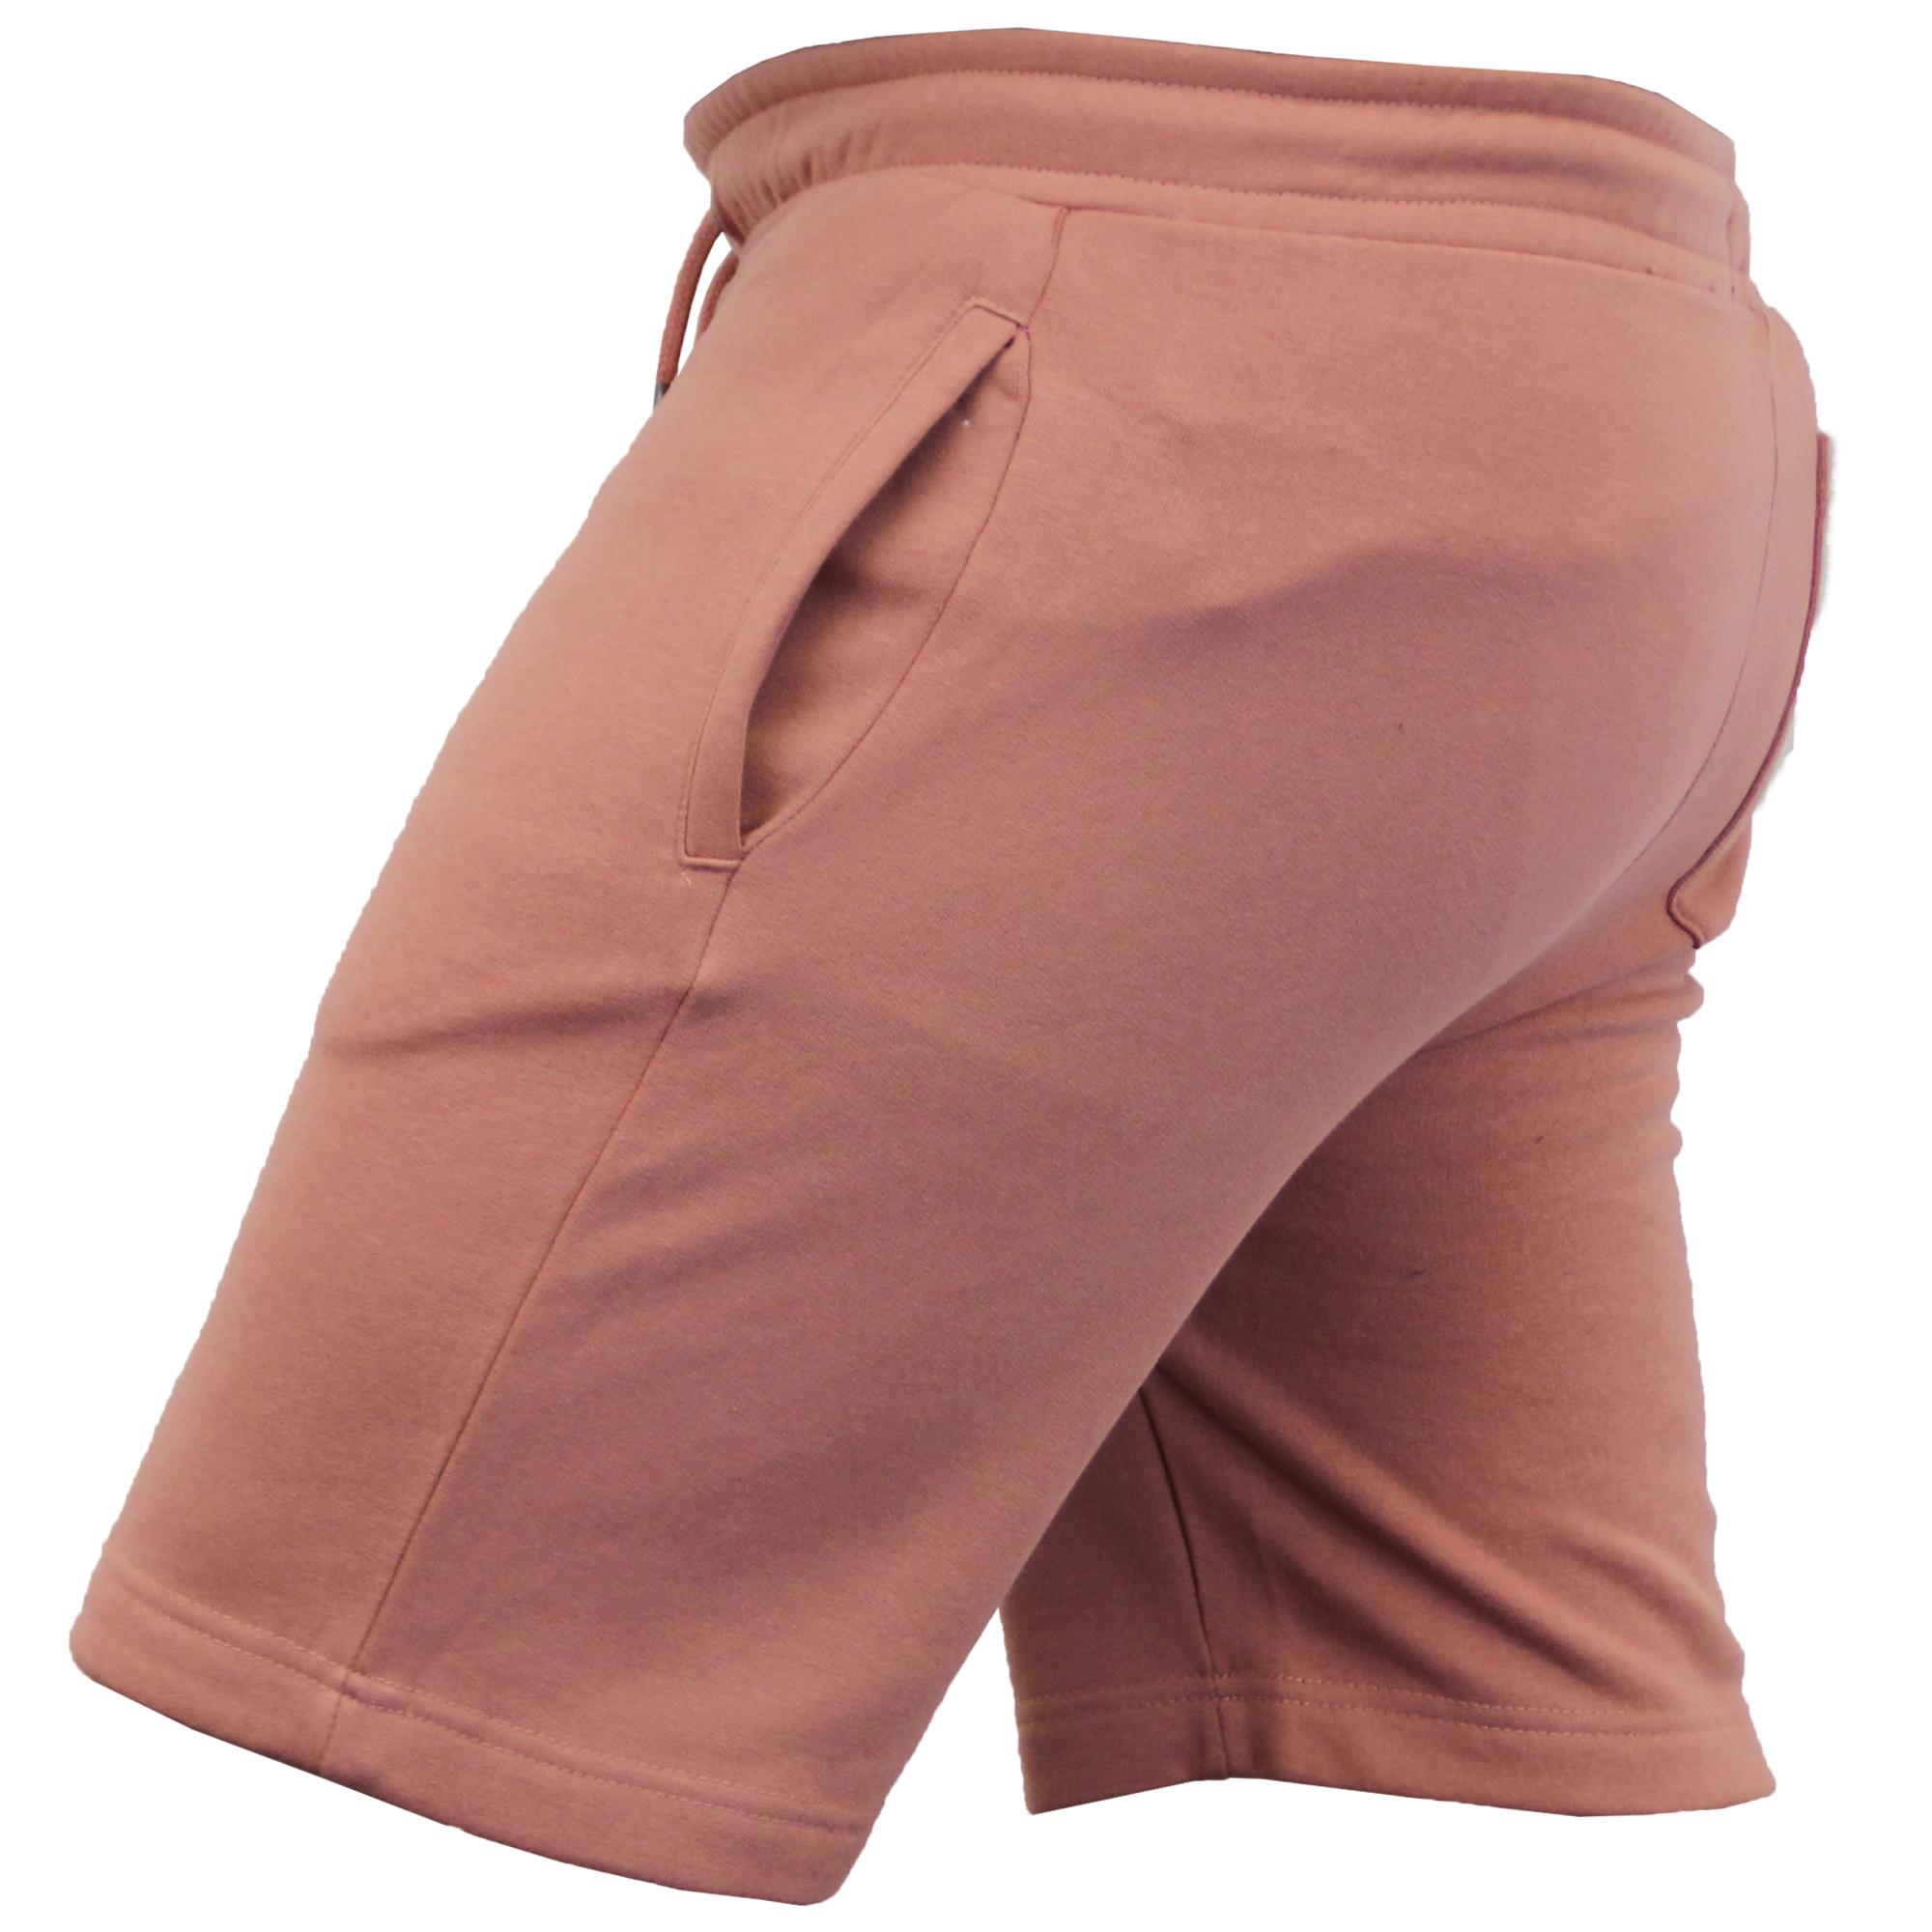 Mens-Jogger-Shorts-Tarley-by-Brave-Soul-Knee-Length-Casual-Fleece-Lined-Summer thumbnail 34